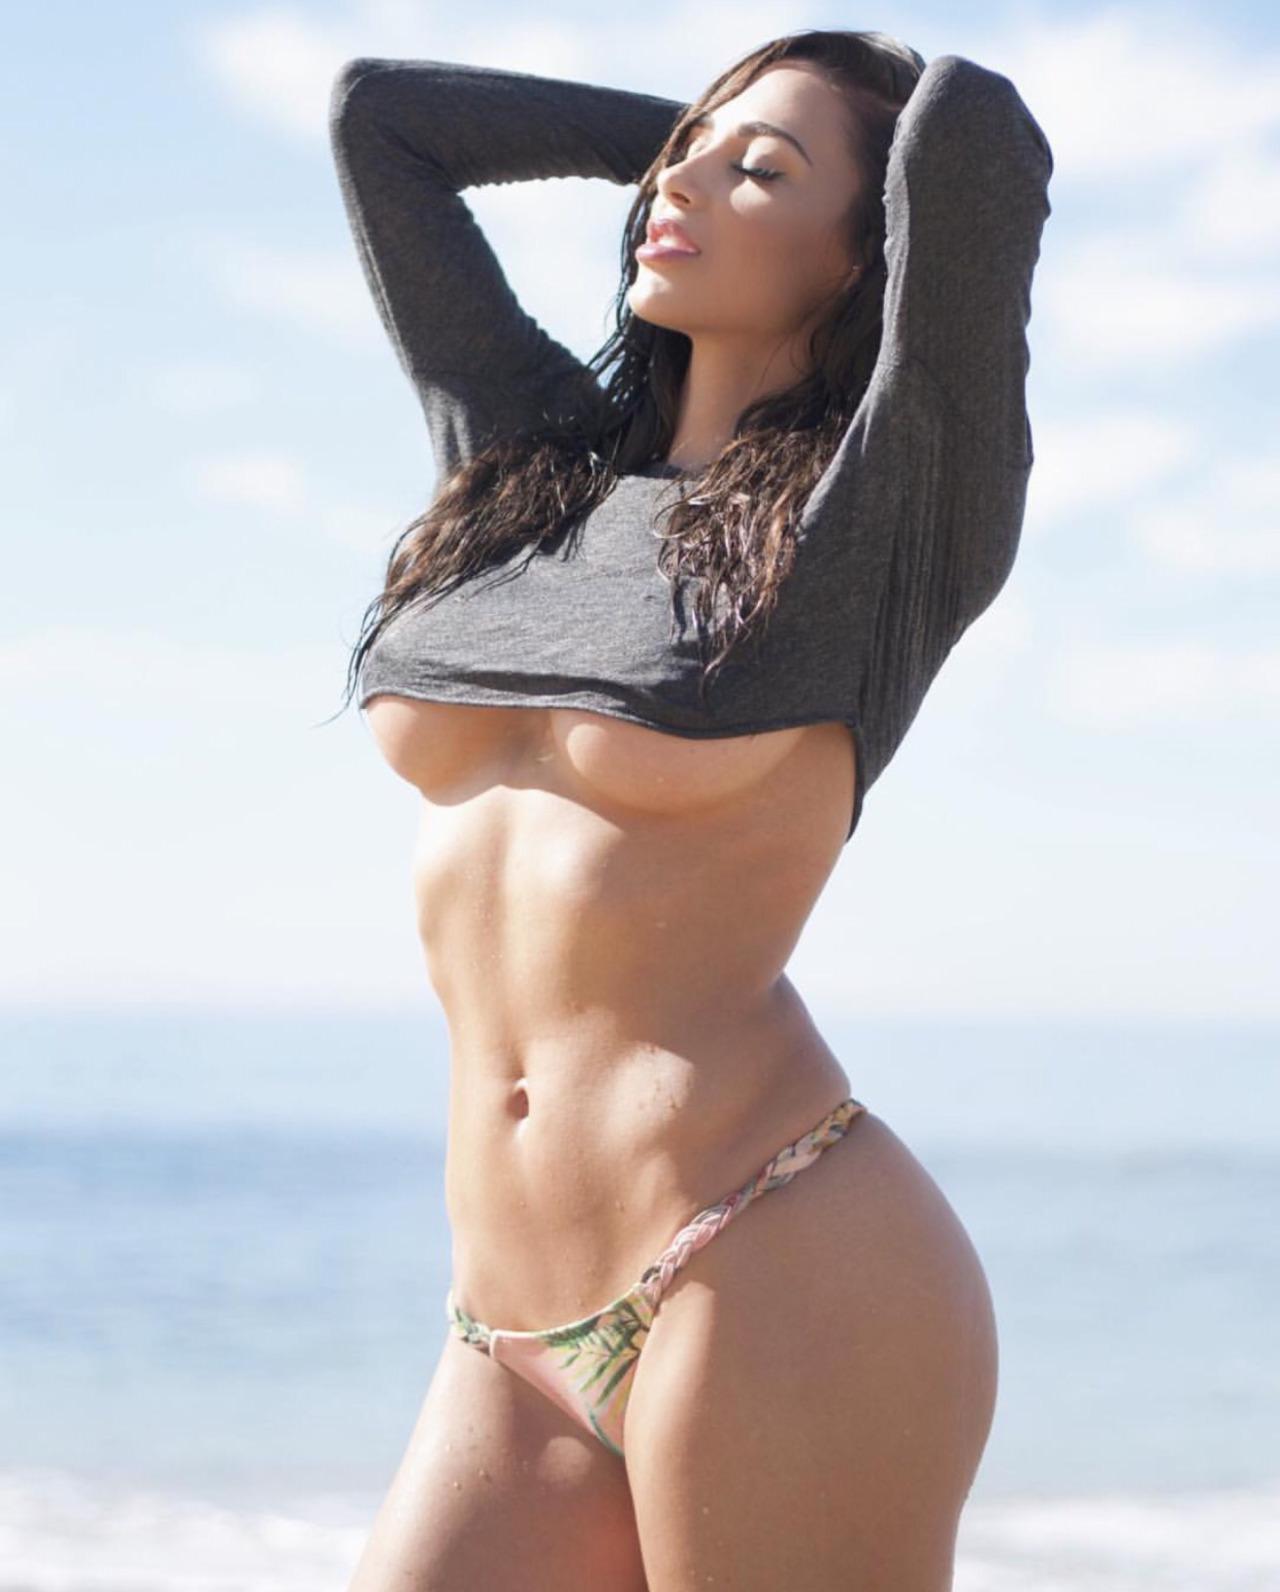 Ana Garcia Porno ana cheri garcia porn pic - eporner